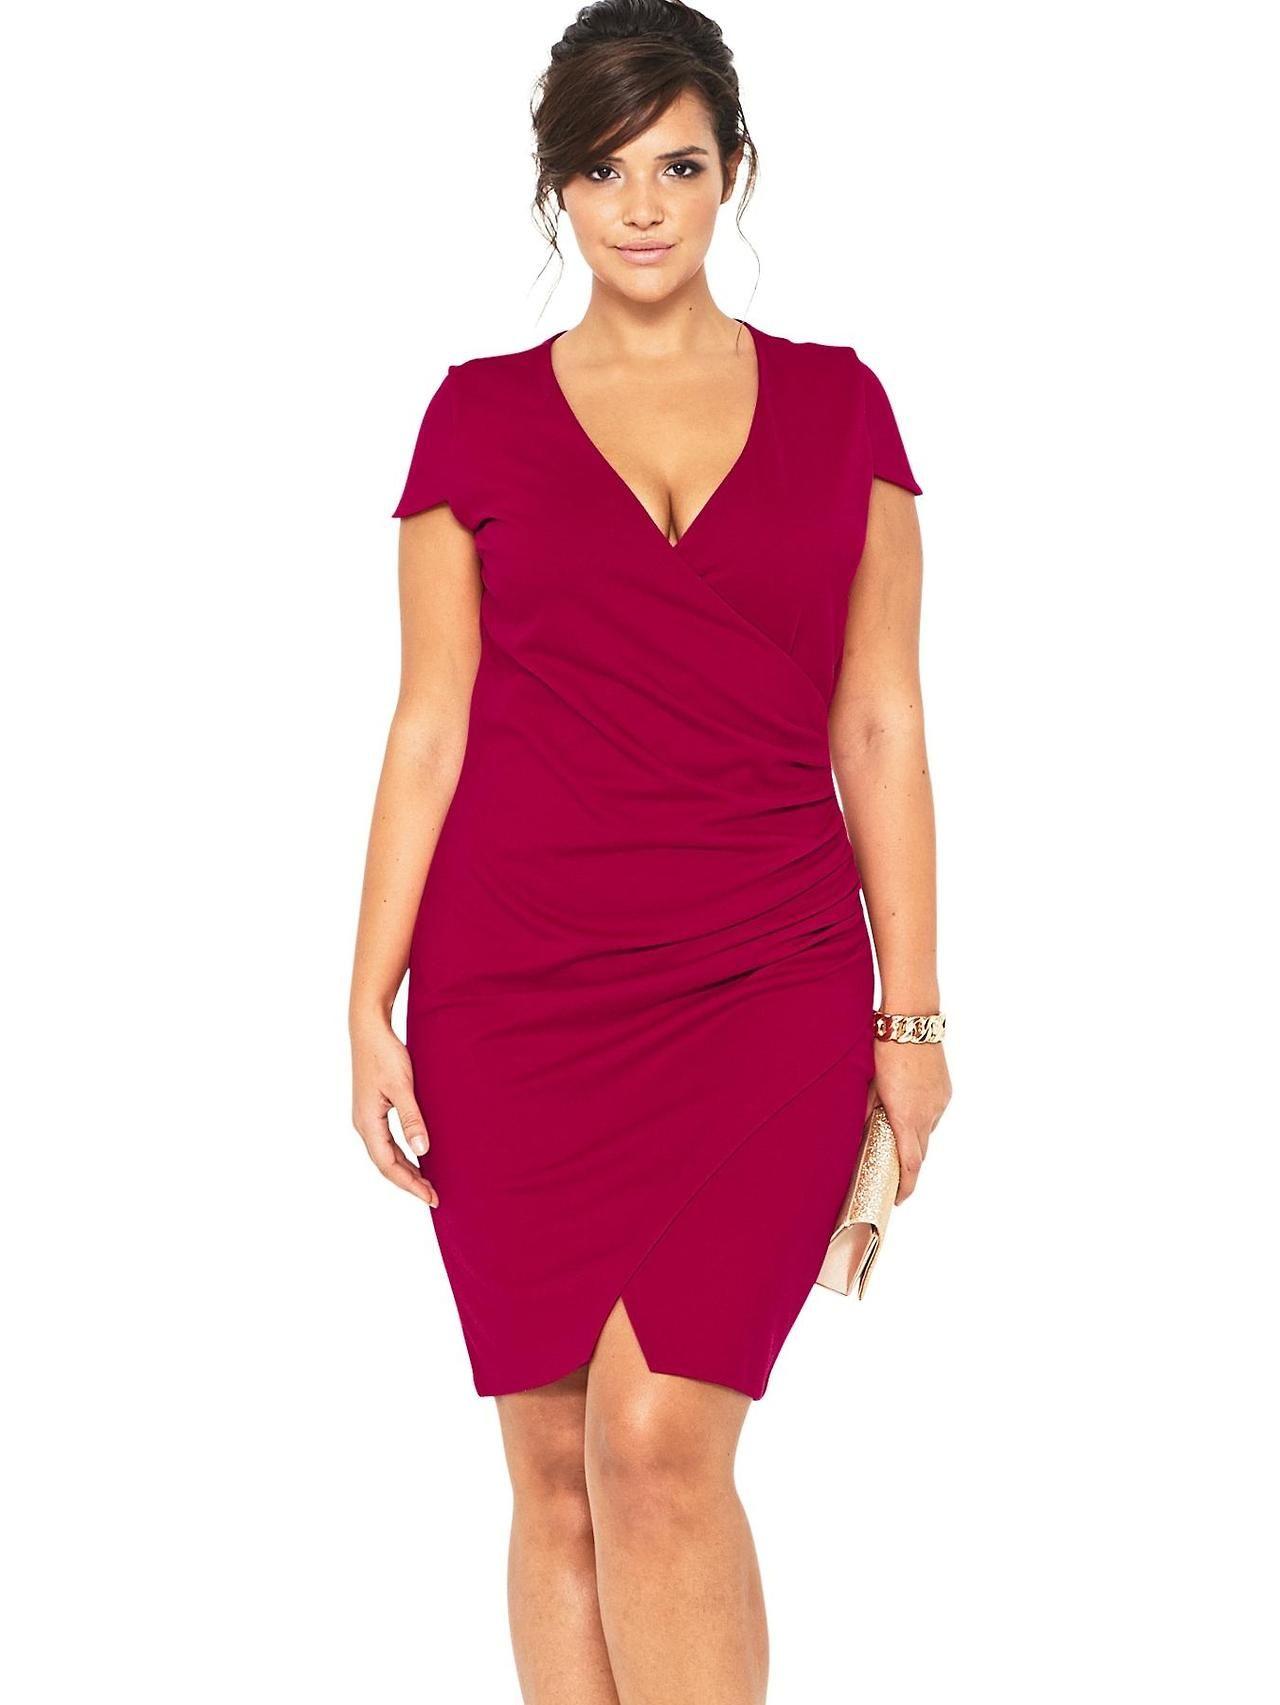 1f755104d6d016 Emma 36D bust, 31 inch waist, 44 inch hips So Fabulous Wrap Ponte Dress at  Littlewoods (via Shopstyle UK)